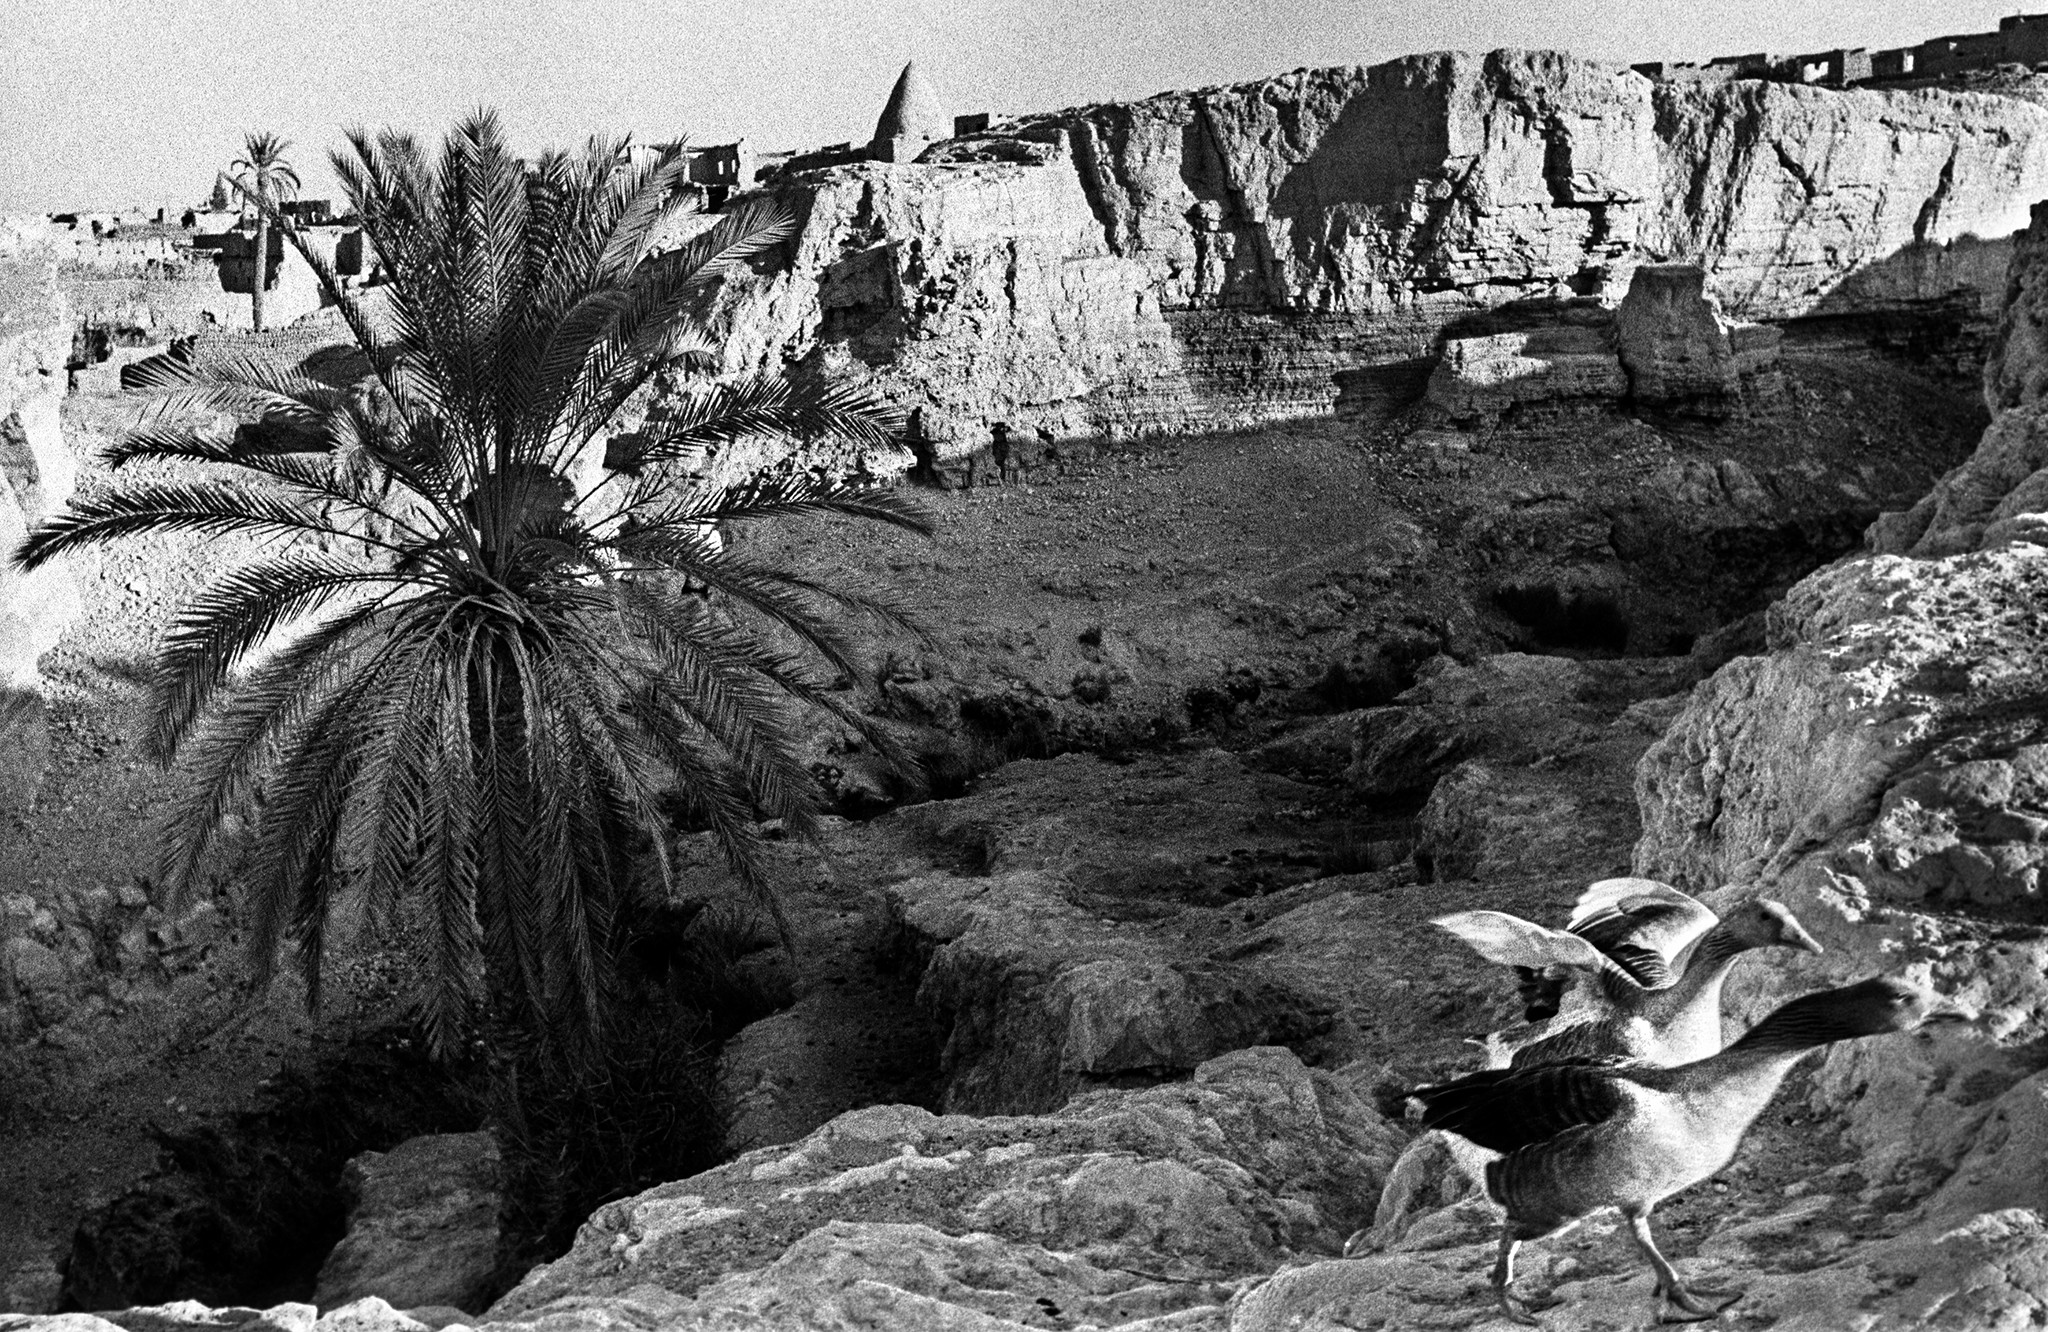 Sèrie: Els Oasis d'Egipte. Oques de Meidoun. Bahariya. Oasis d'Egipte. 1984